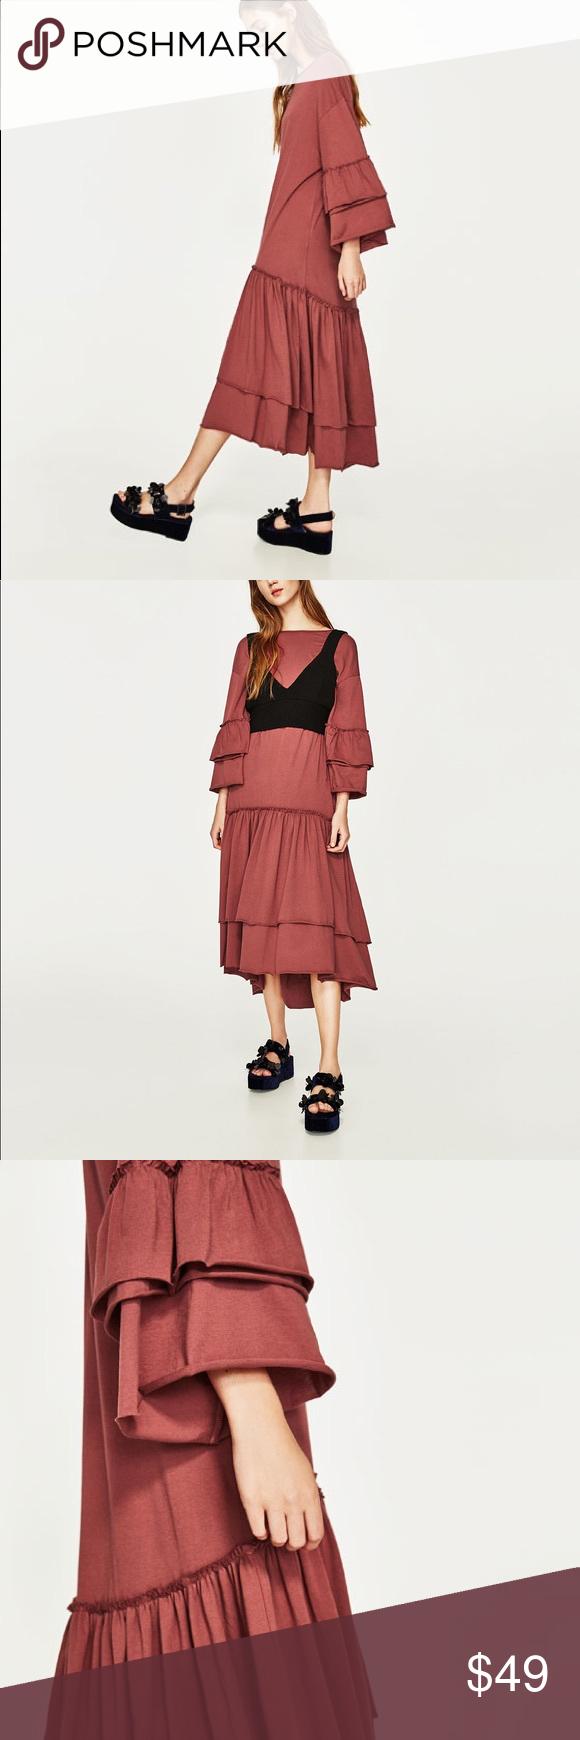 Zara dark pink long frilly dress frilly dresses zara dresses and